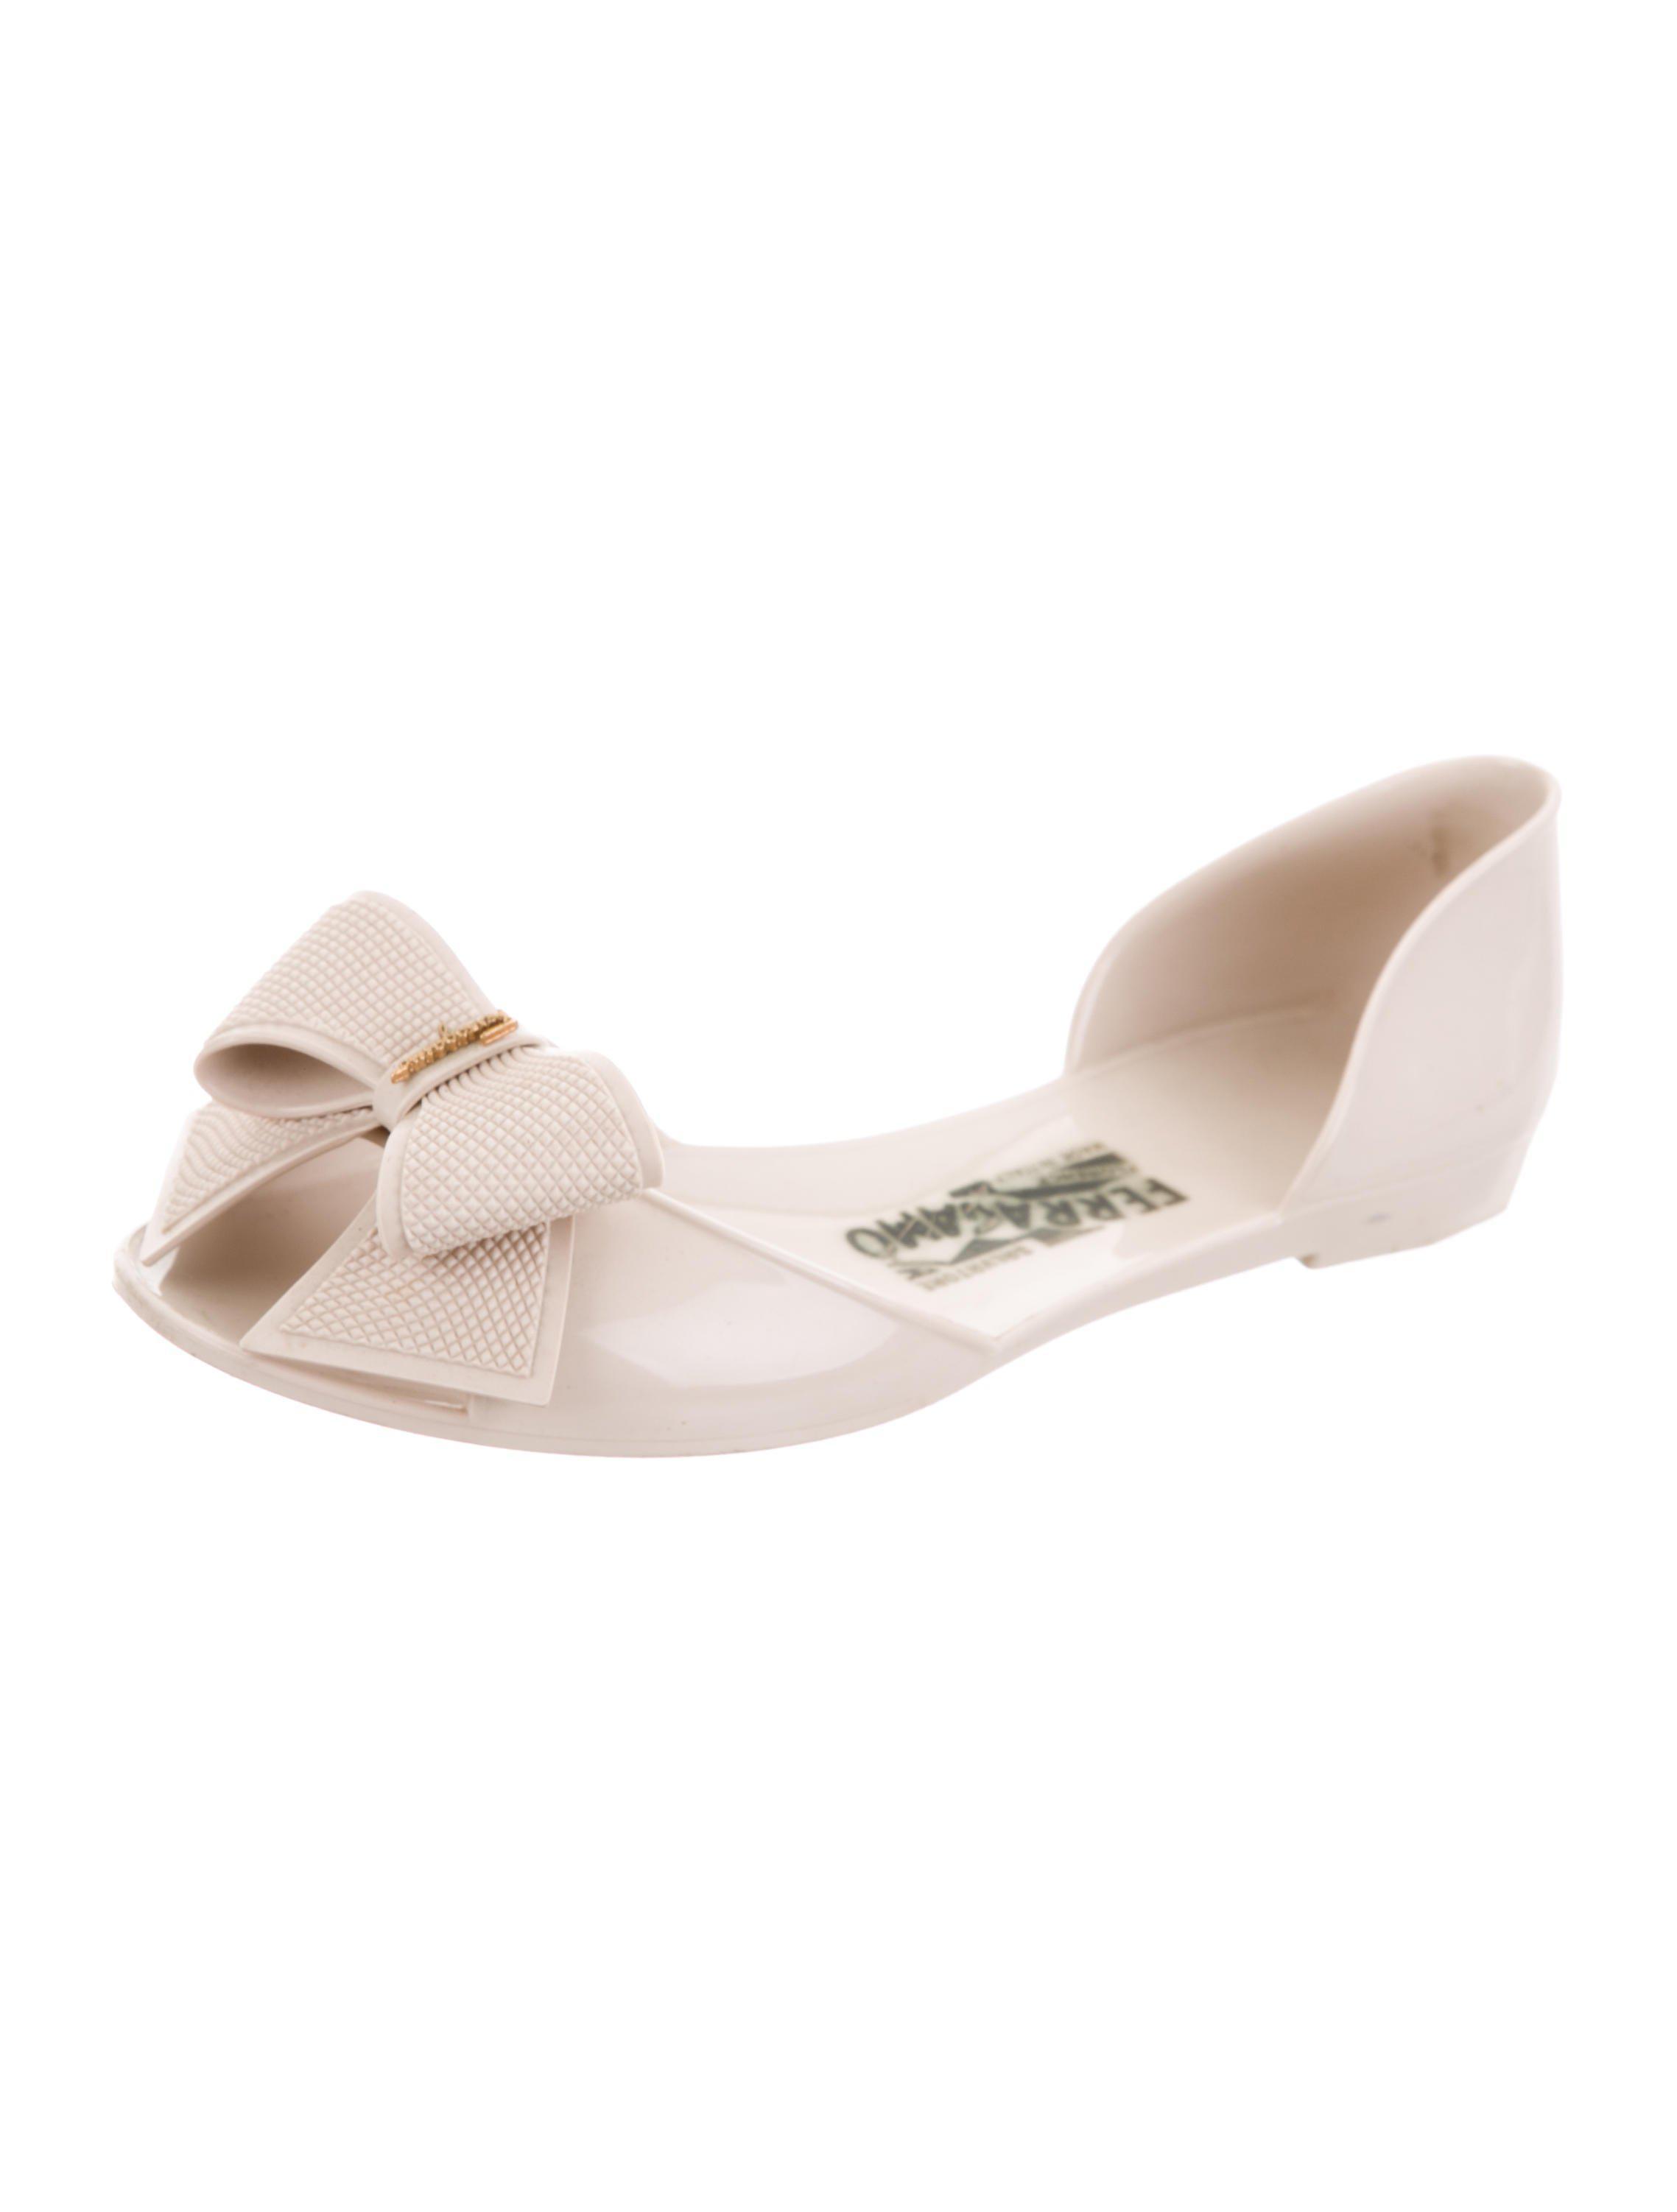 5dc4be4b9 Lyst - Ferragamo Bow Jelly Sandals Beige in Metallic